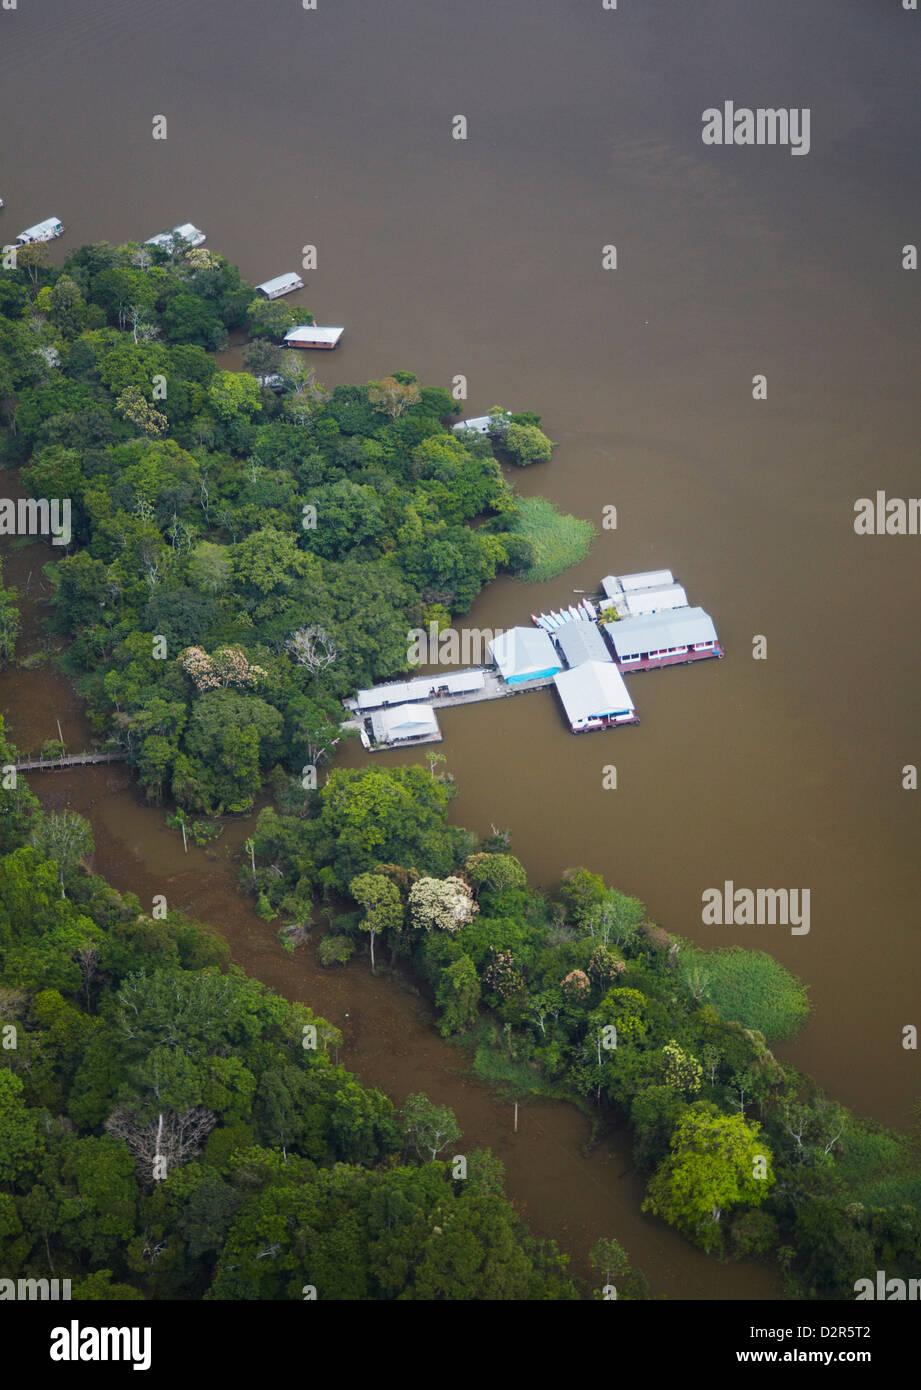 Aerial view of housing on the Rio Negro, Manaus, Amazonas, Brazil, South America - Stock Image